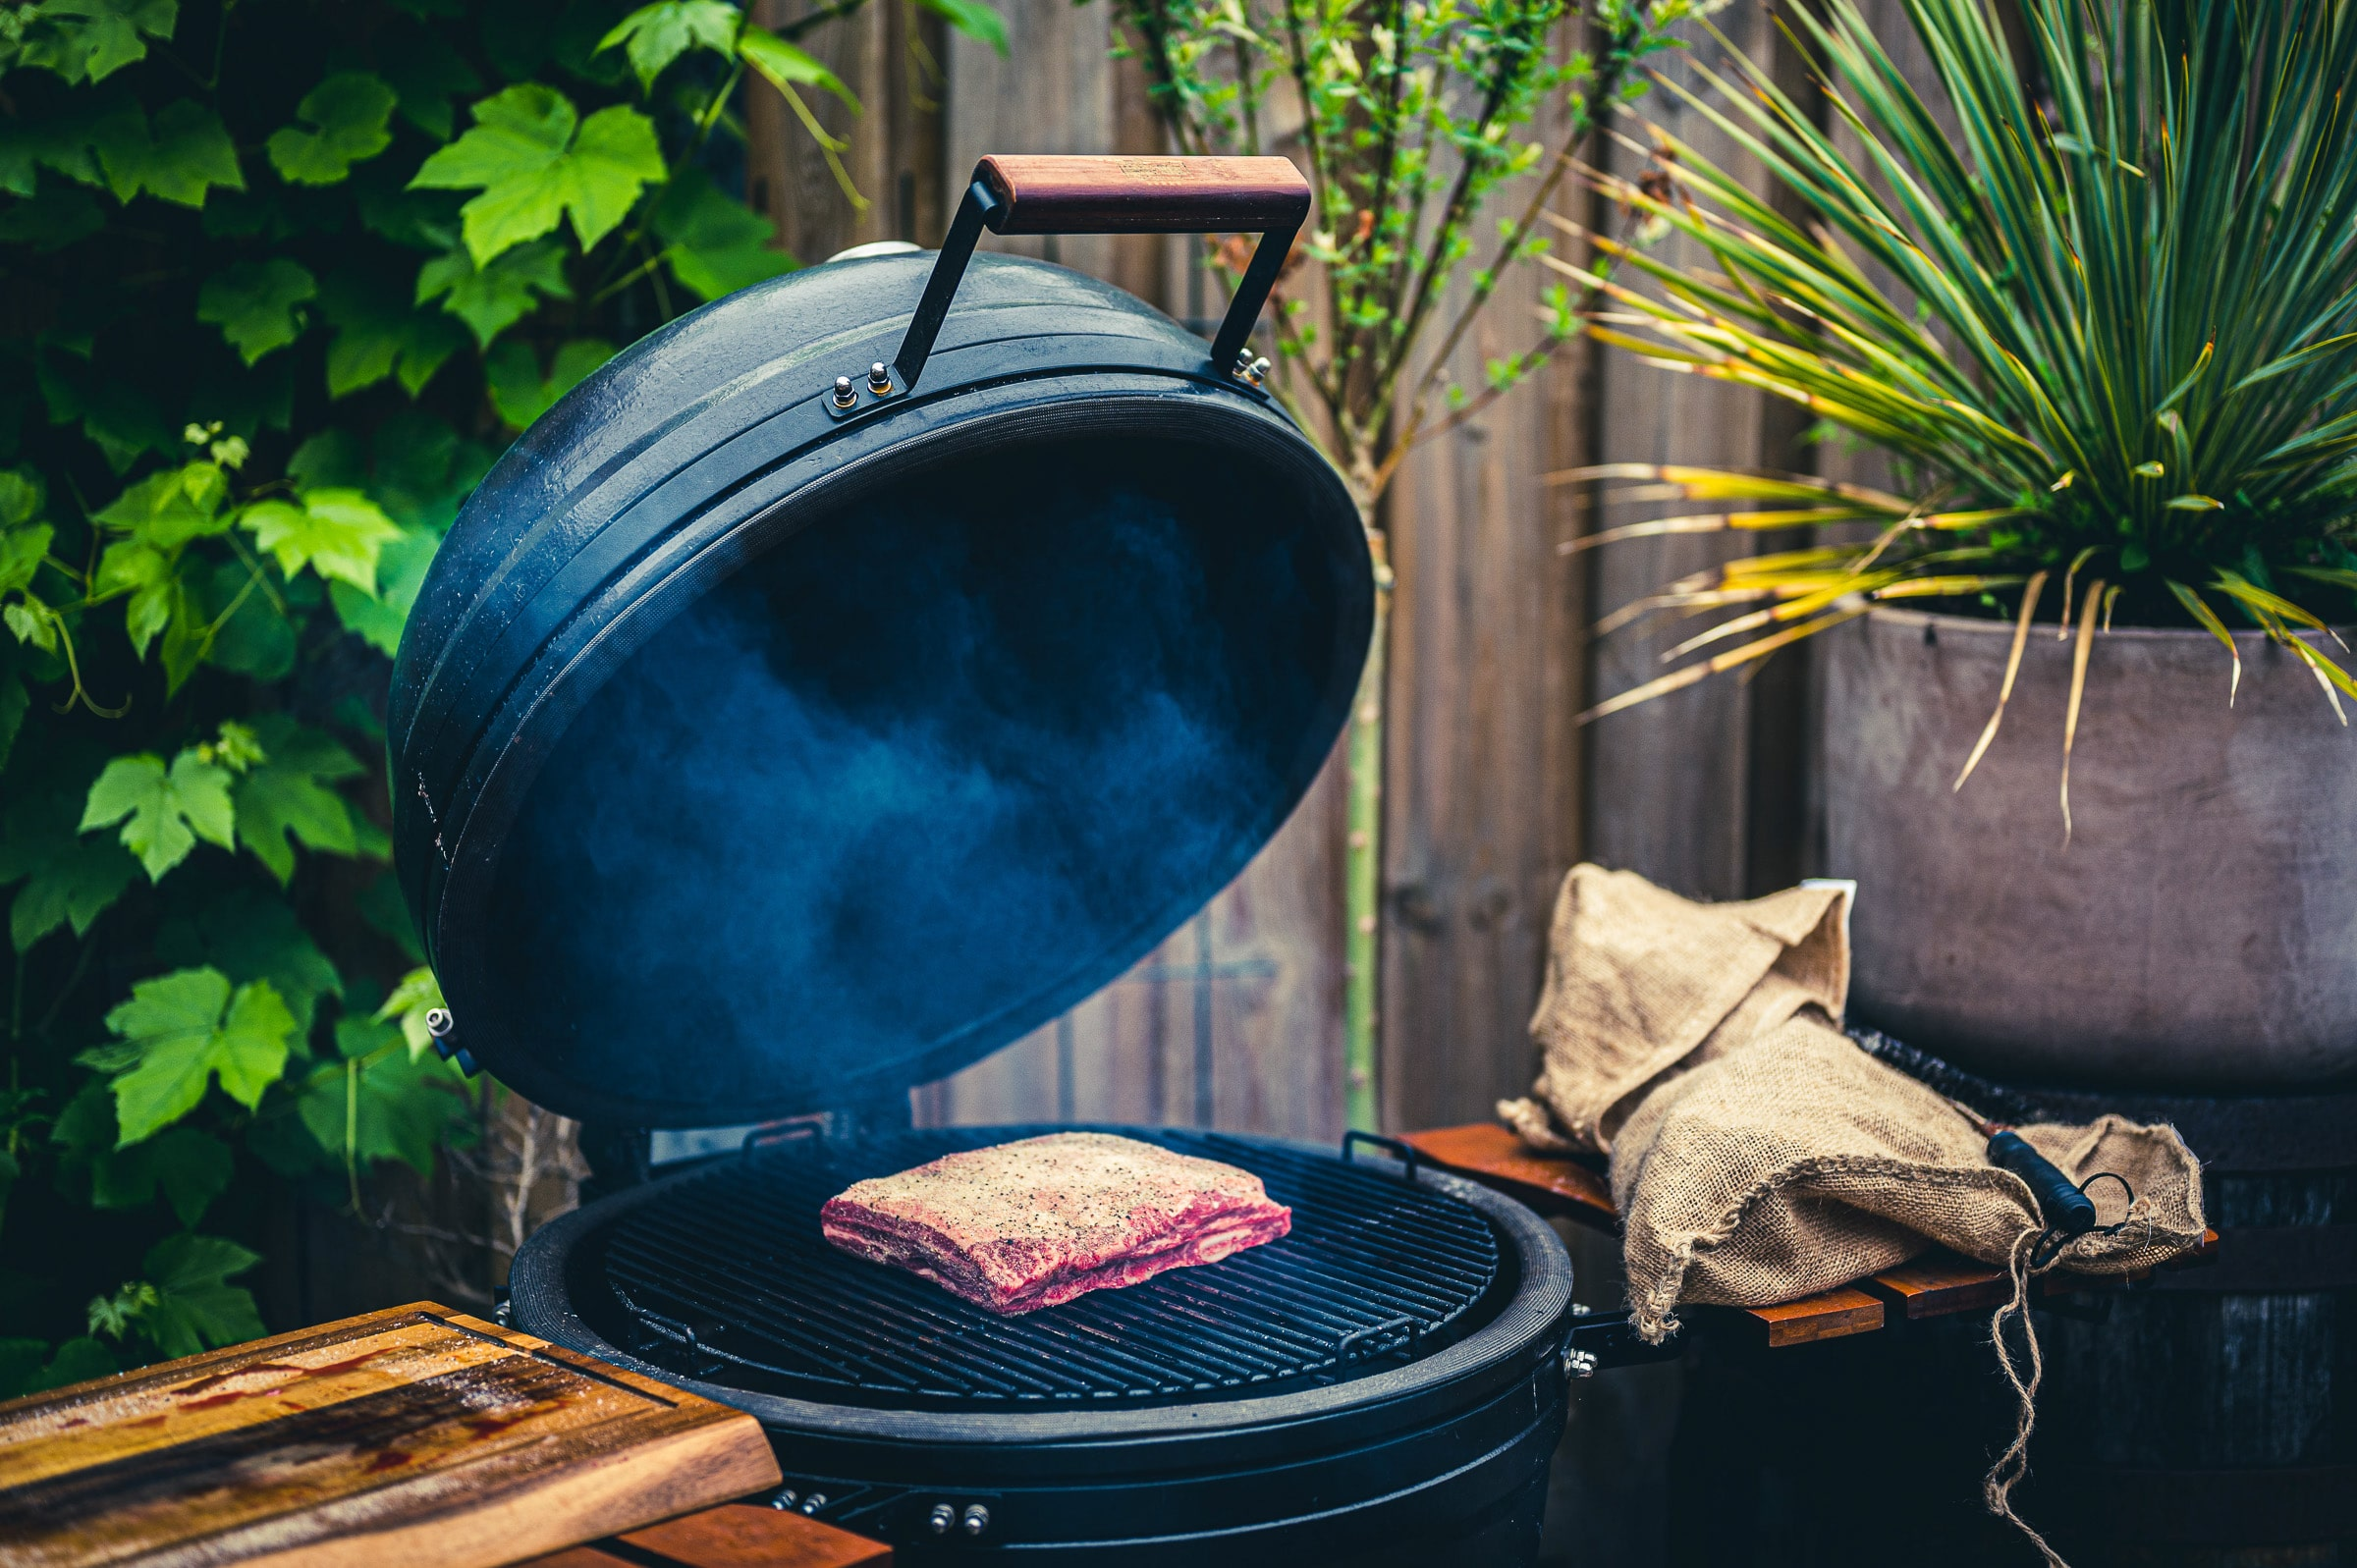 smokey shortibs recept op de kamadomac and cheese recept en chickenwings1x1-7